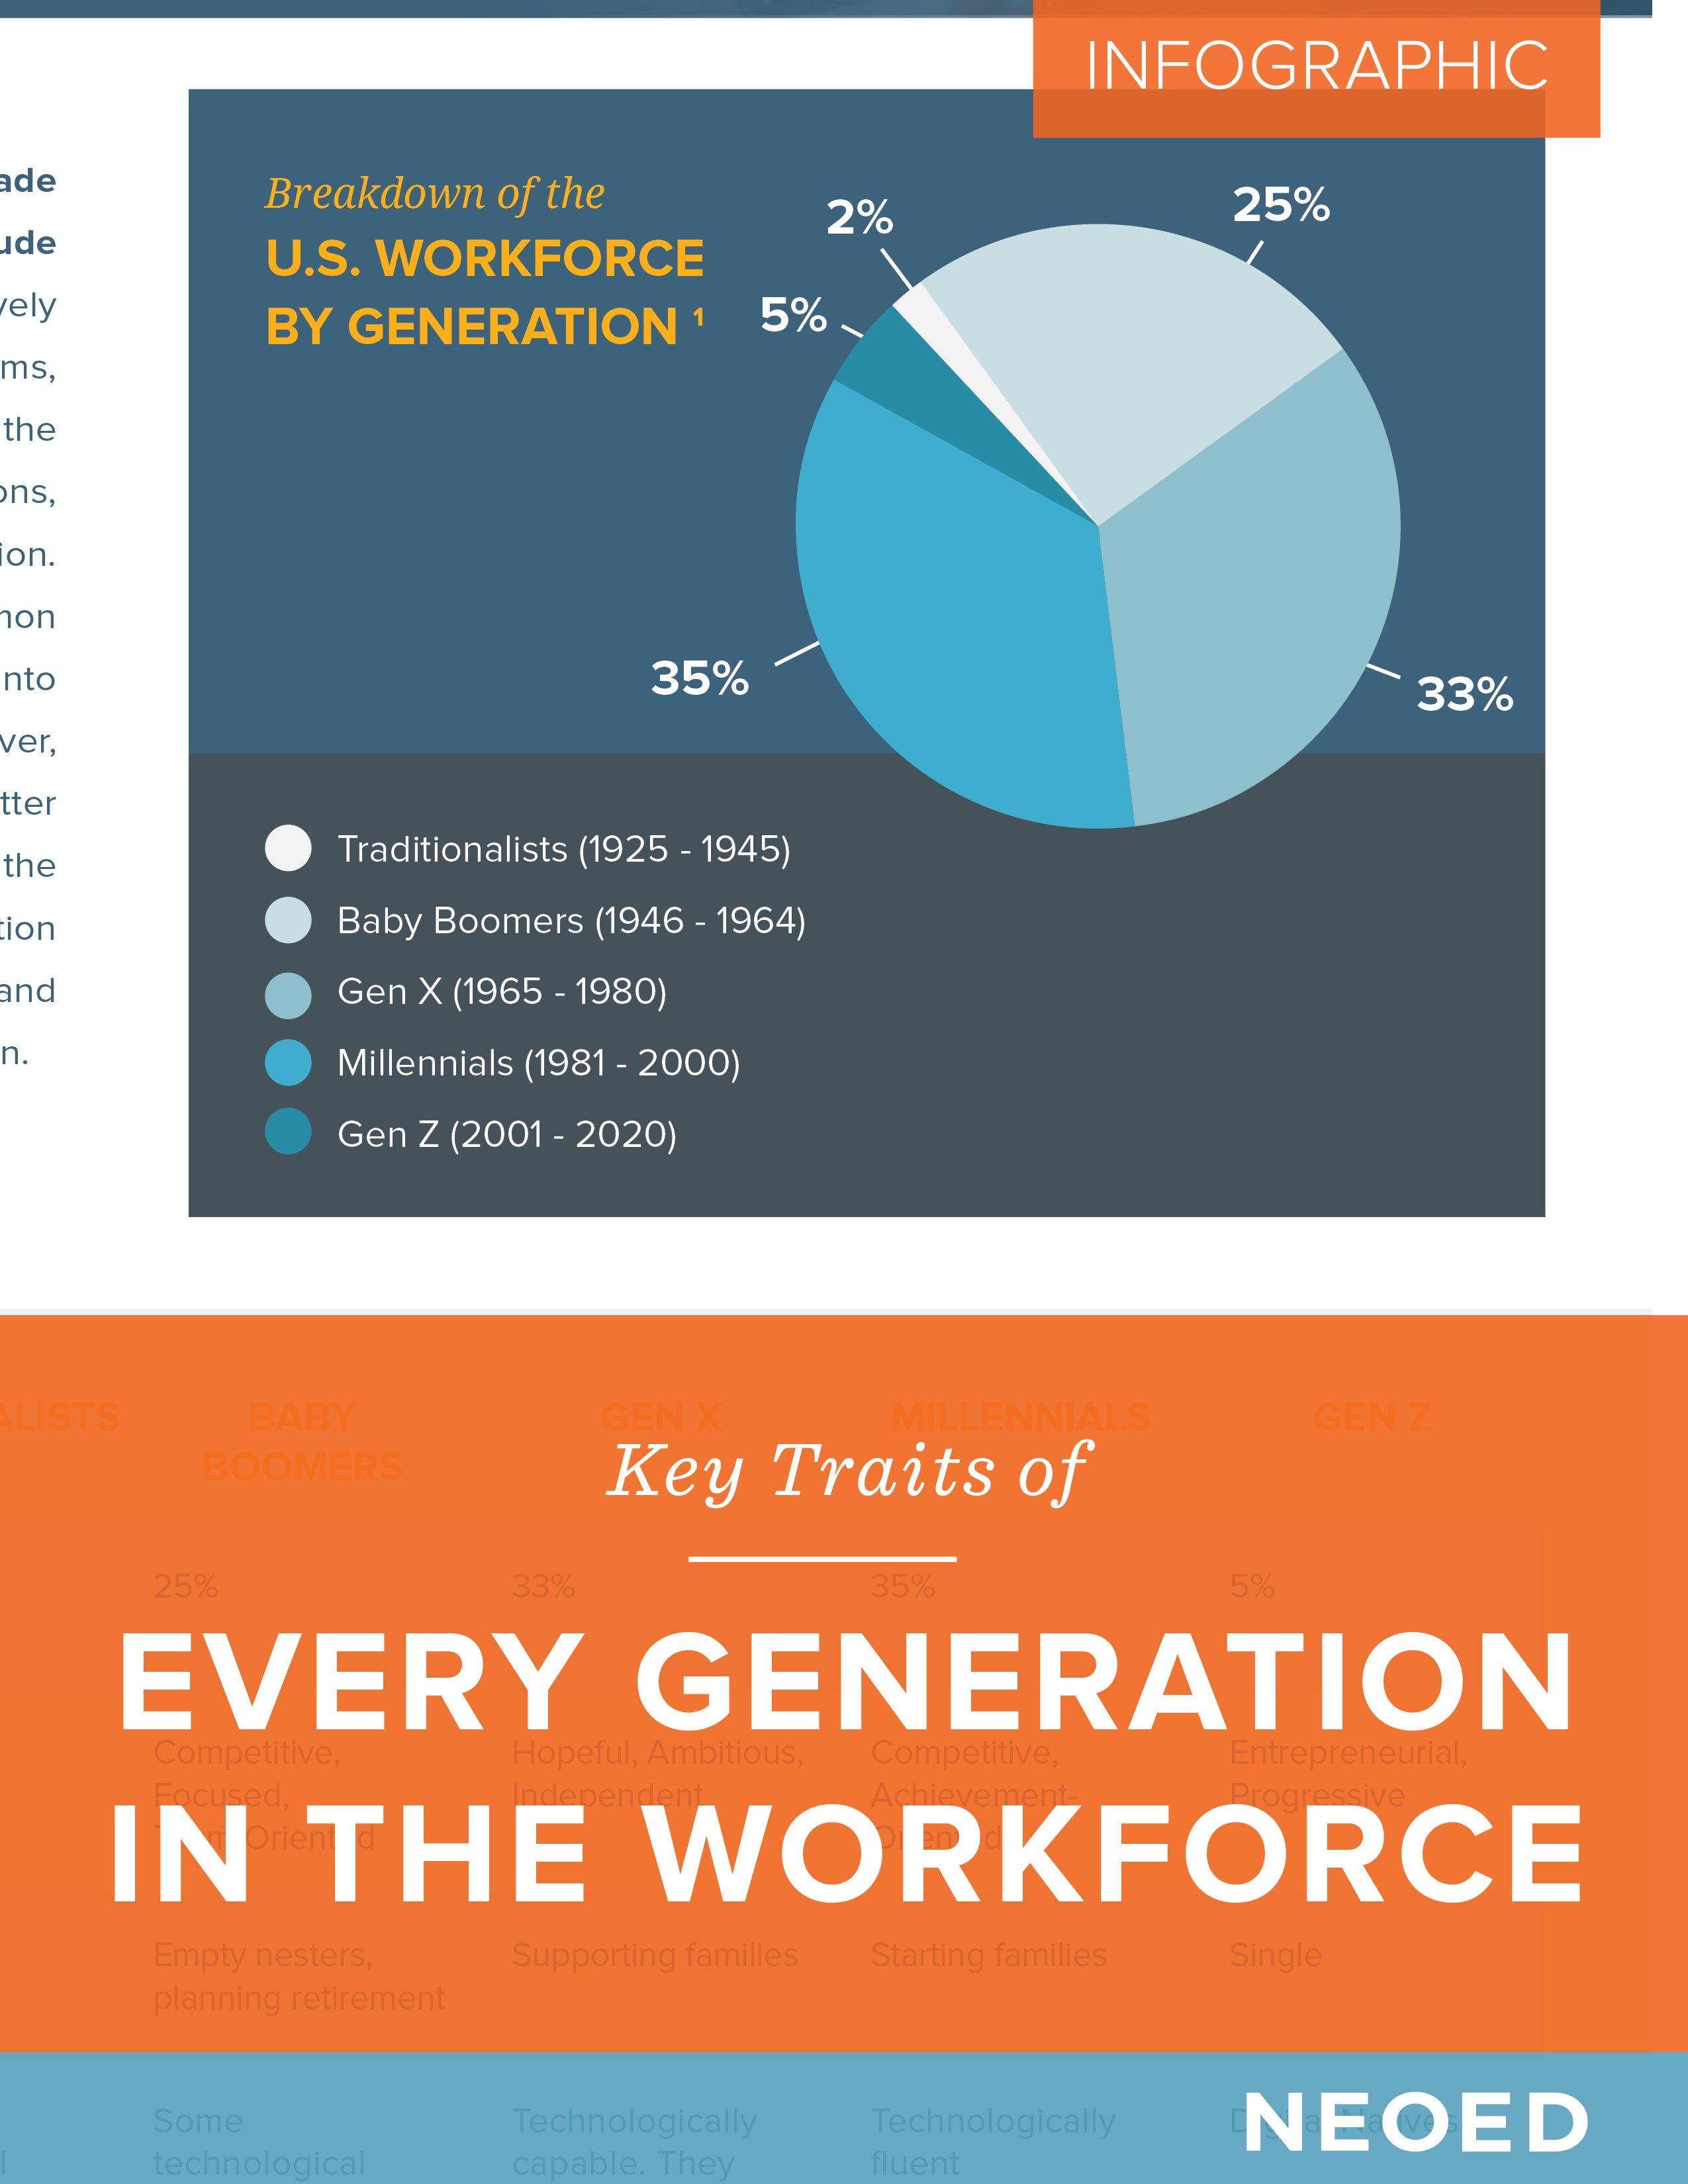 NEOED-Infographic-GenerationsInTheWorkforce-thumbnail